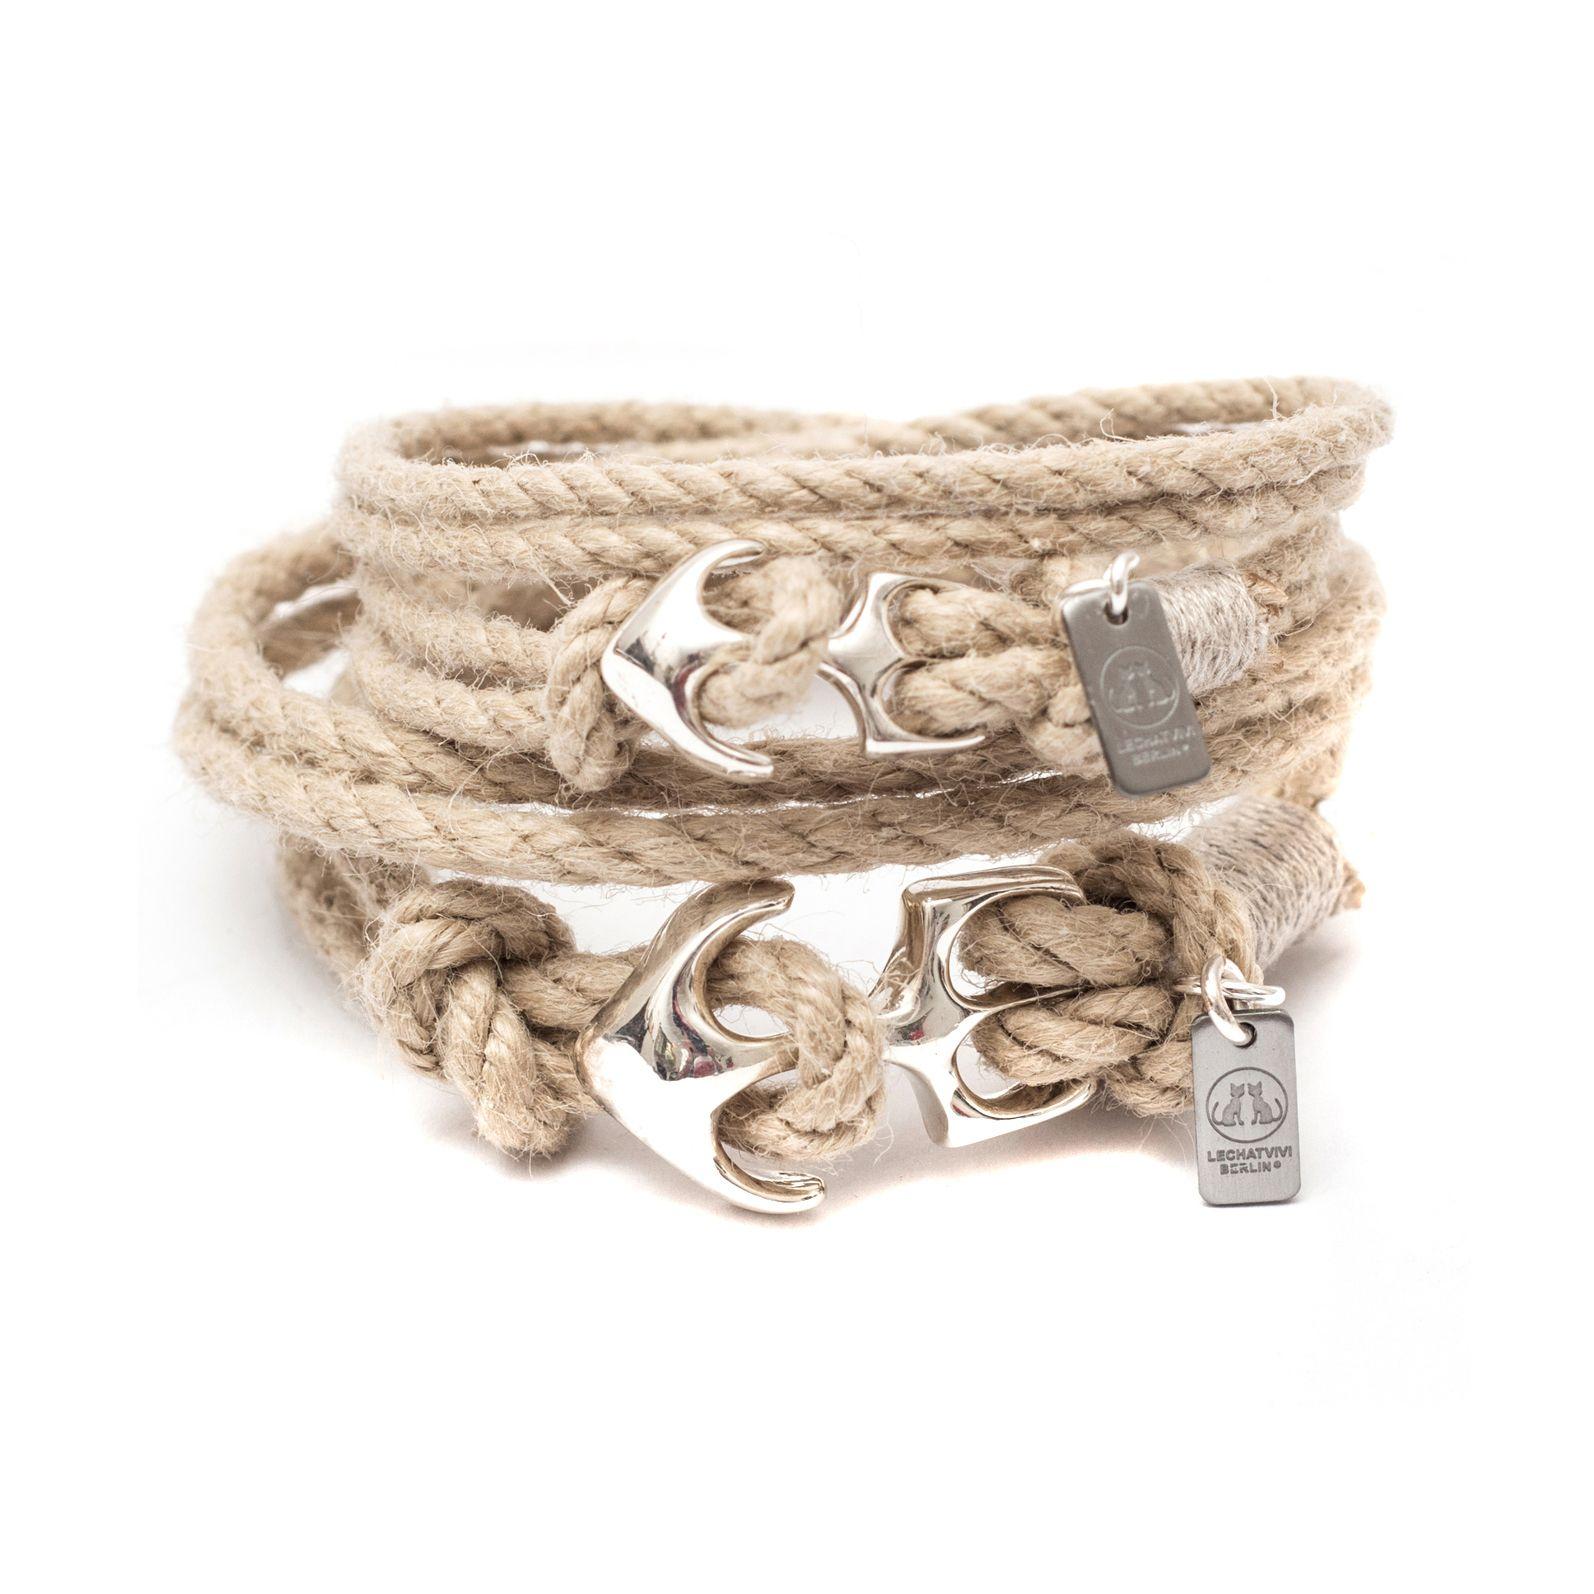 #lechatvivi #ancor #bracelet #ancorbracelet Ancor bracelet by LeChatVIVI BERLIN® with nice material www.lechatvivi-berlin.com